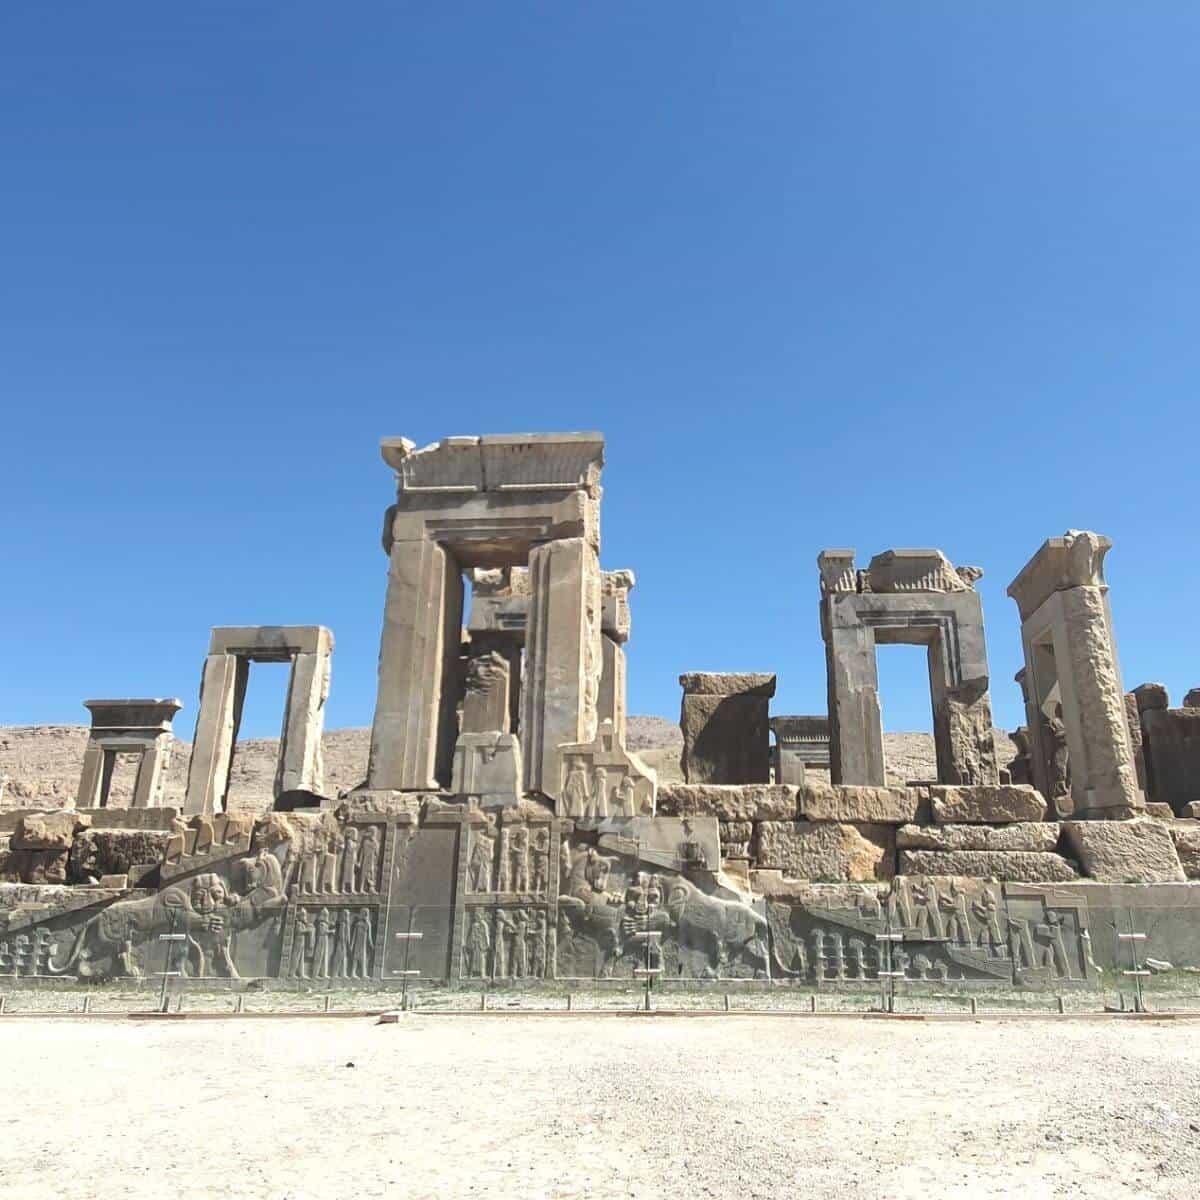 Architecture at Persepolis in Iran.